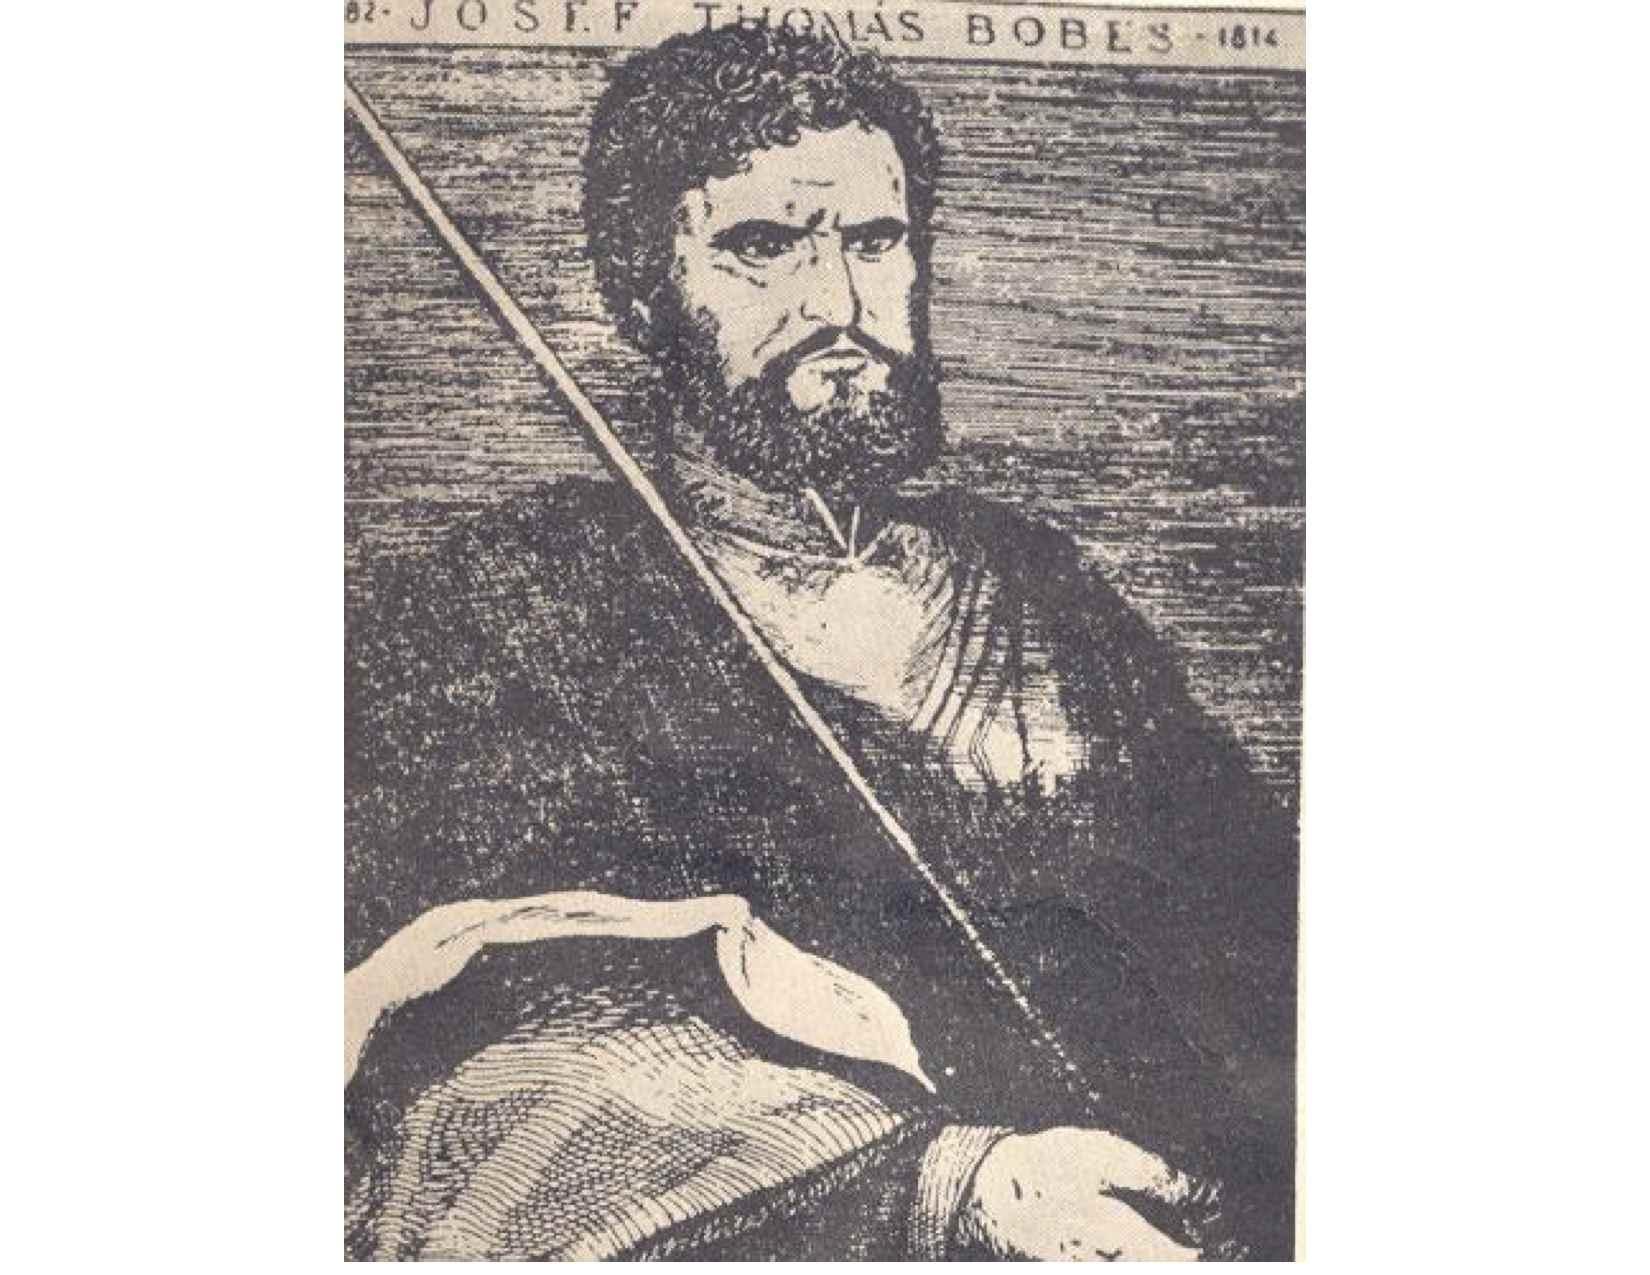 Jose Thomás Bobes - Tatia Bobes